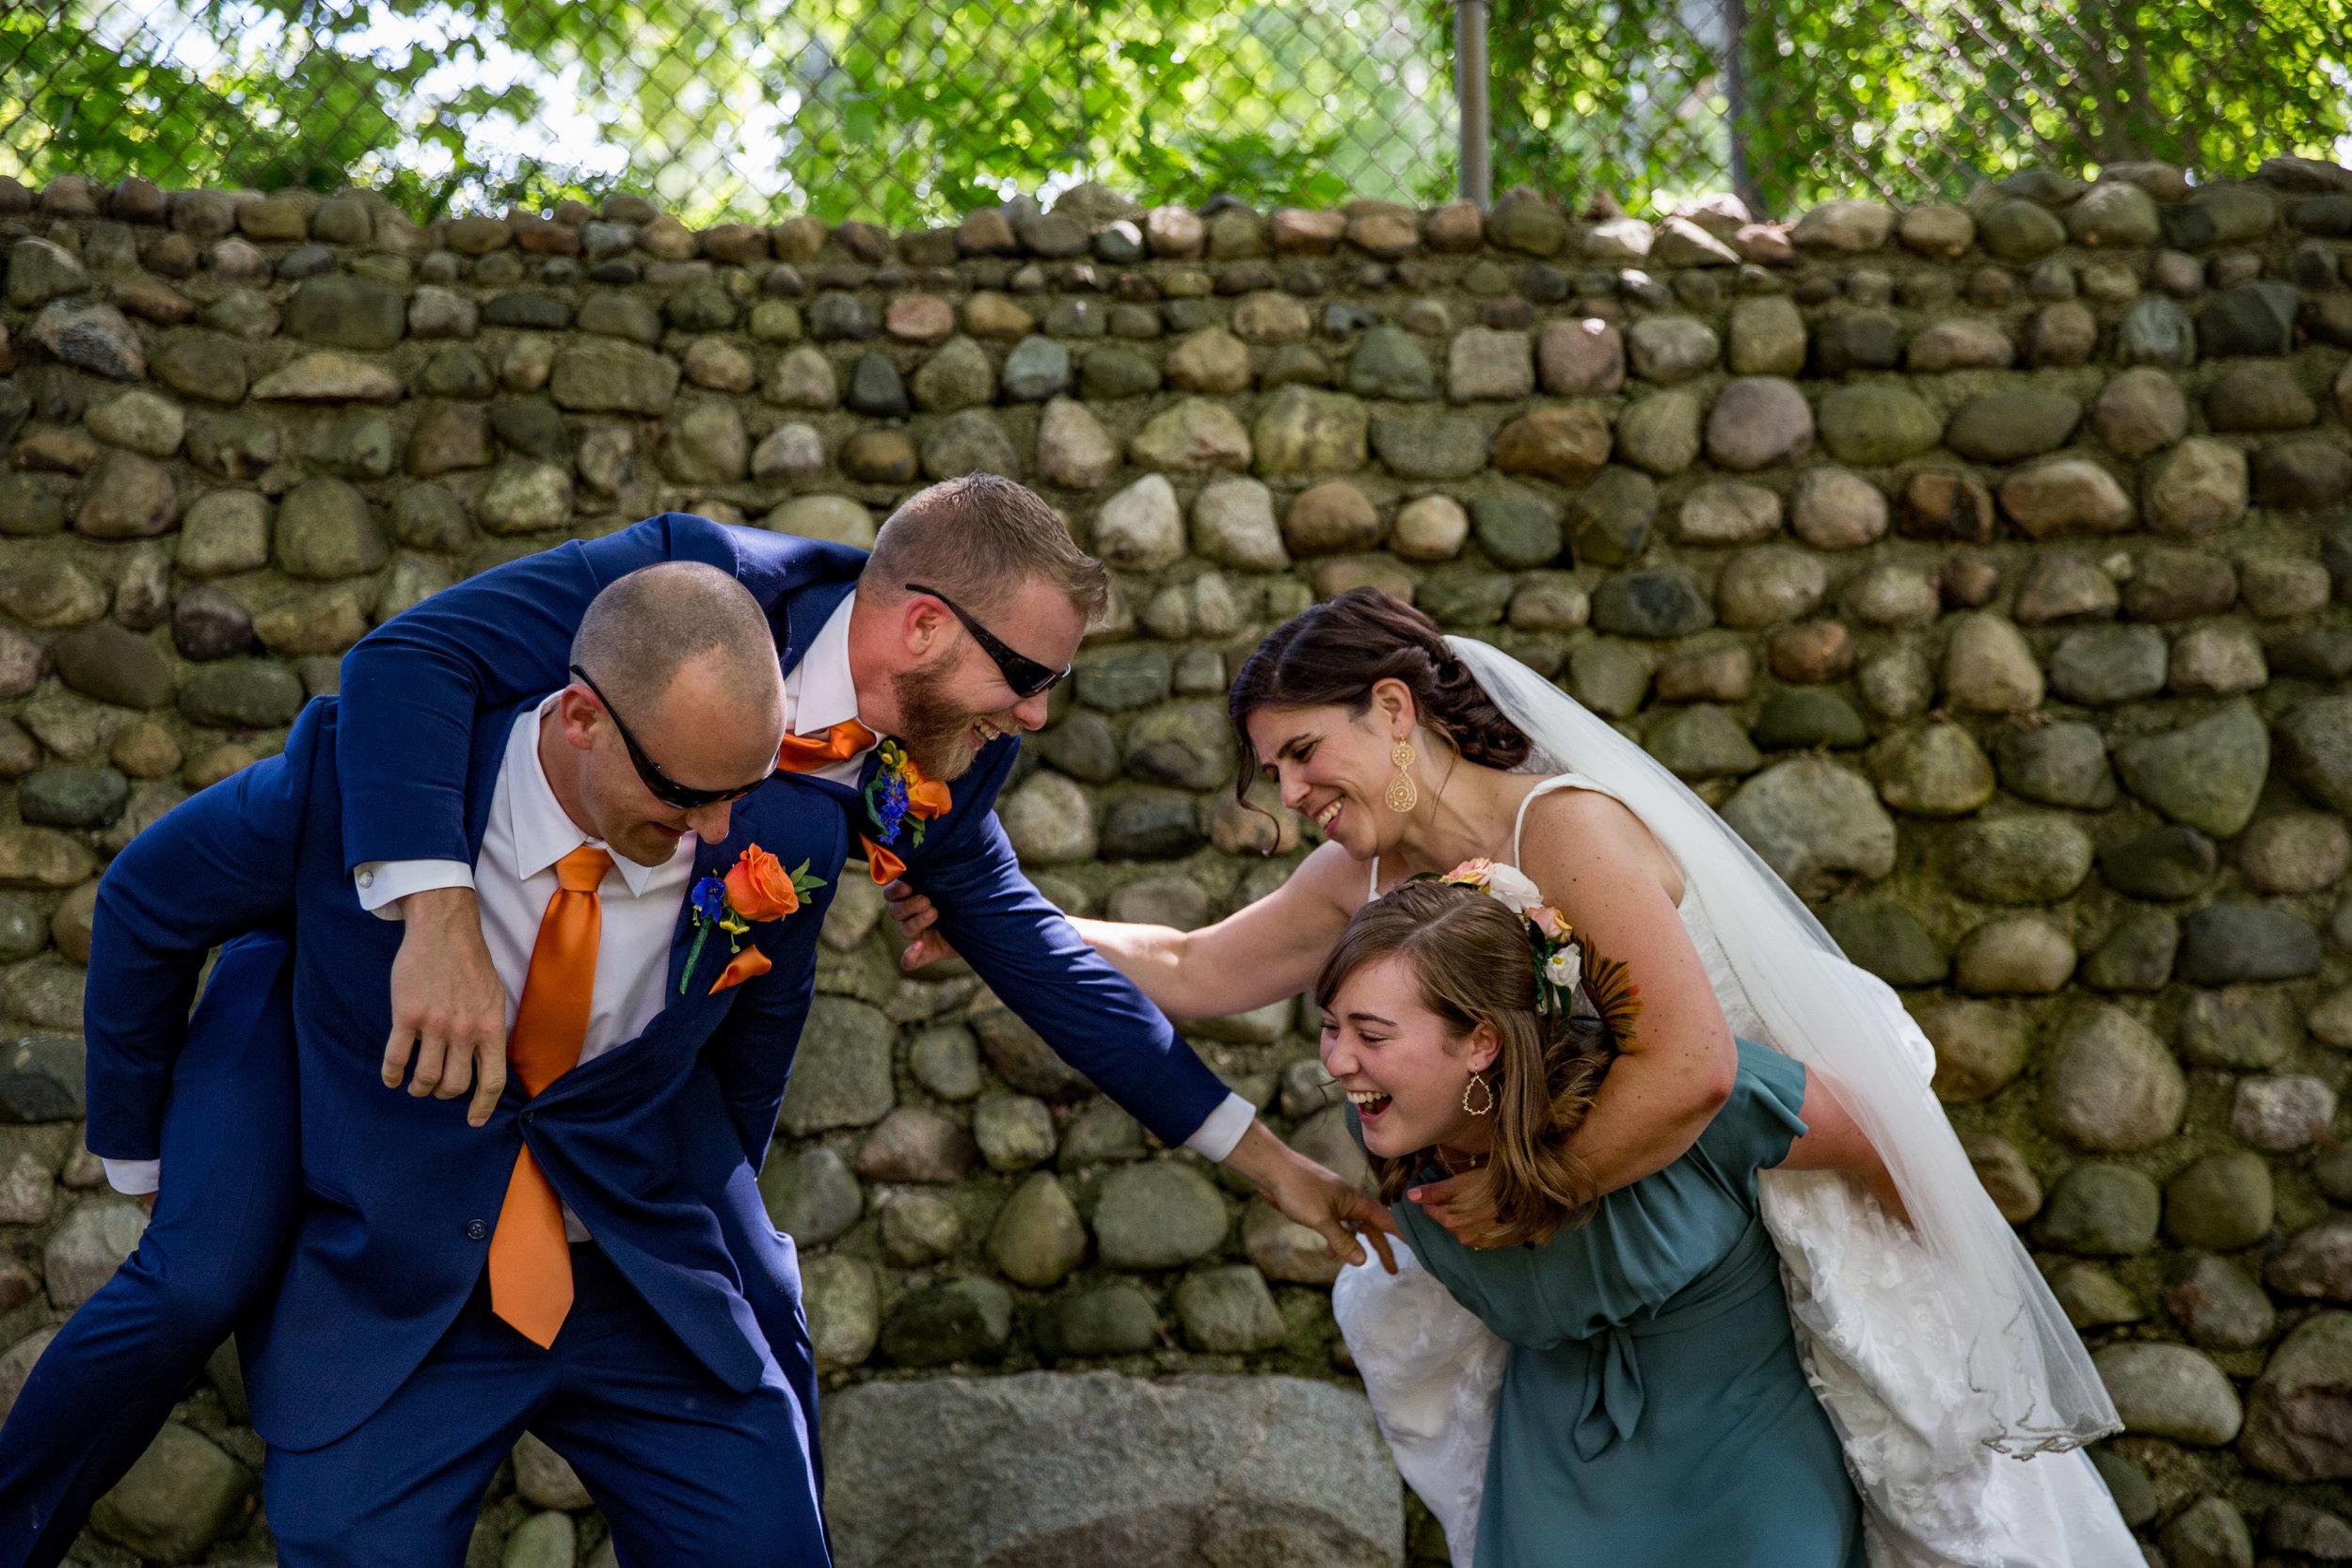 Natalie and Dallas Mooney Wedding 6-8-19_Tania Watt Photography-373.jpg